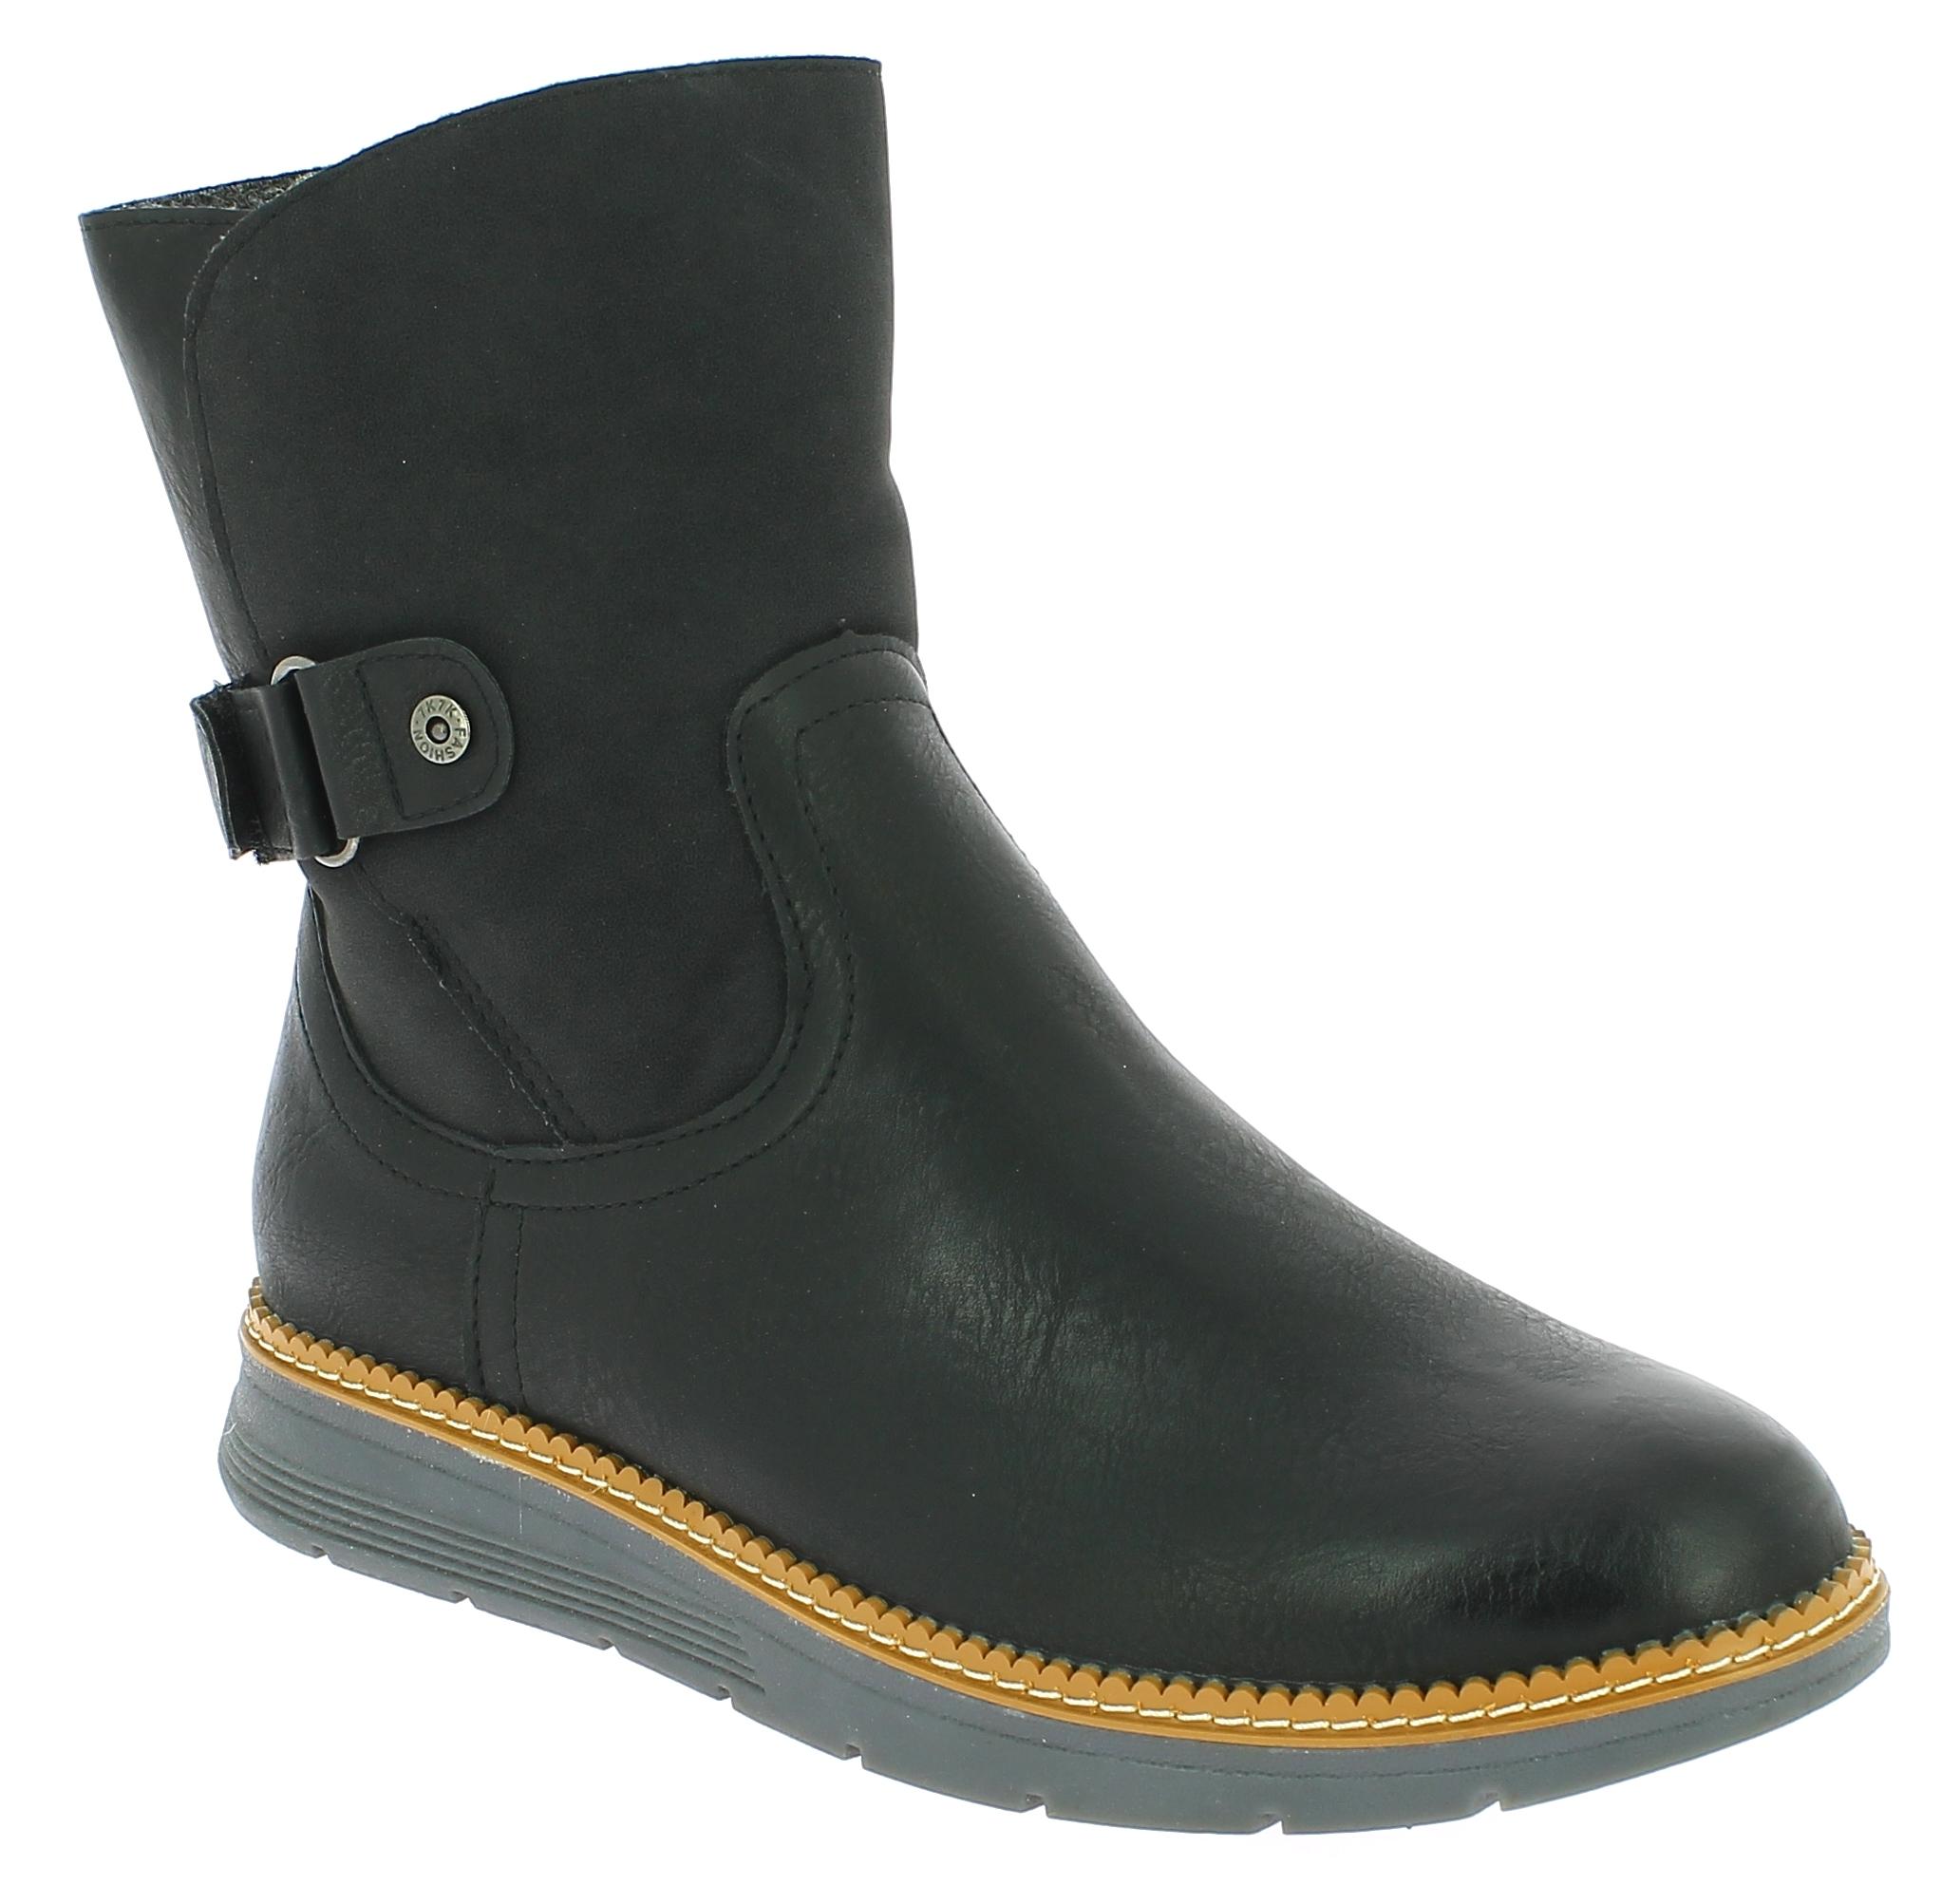 IQSHOES Γυναικείο Μποτάκι 2972901 Μαύρο - IqShoes - 2.972901 BLACK-black-38/1/15 παπούτσια  new in